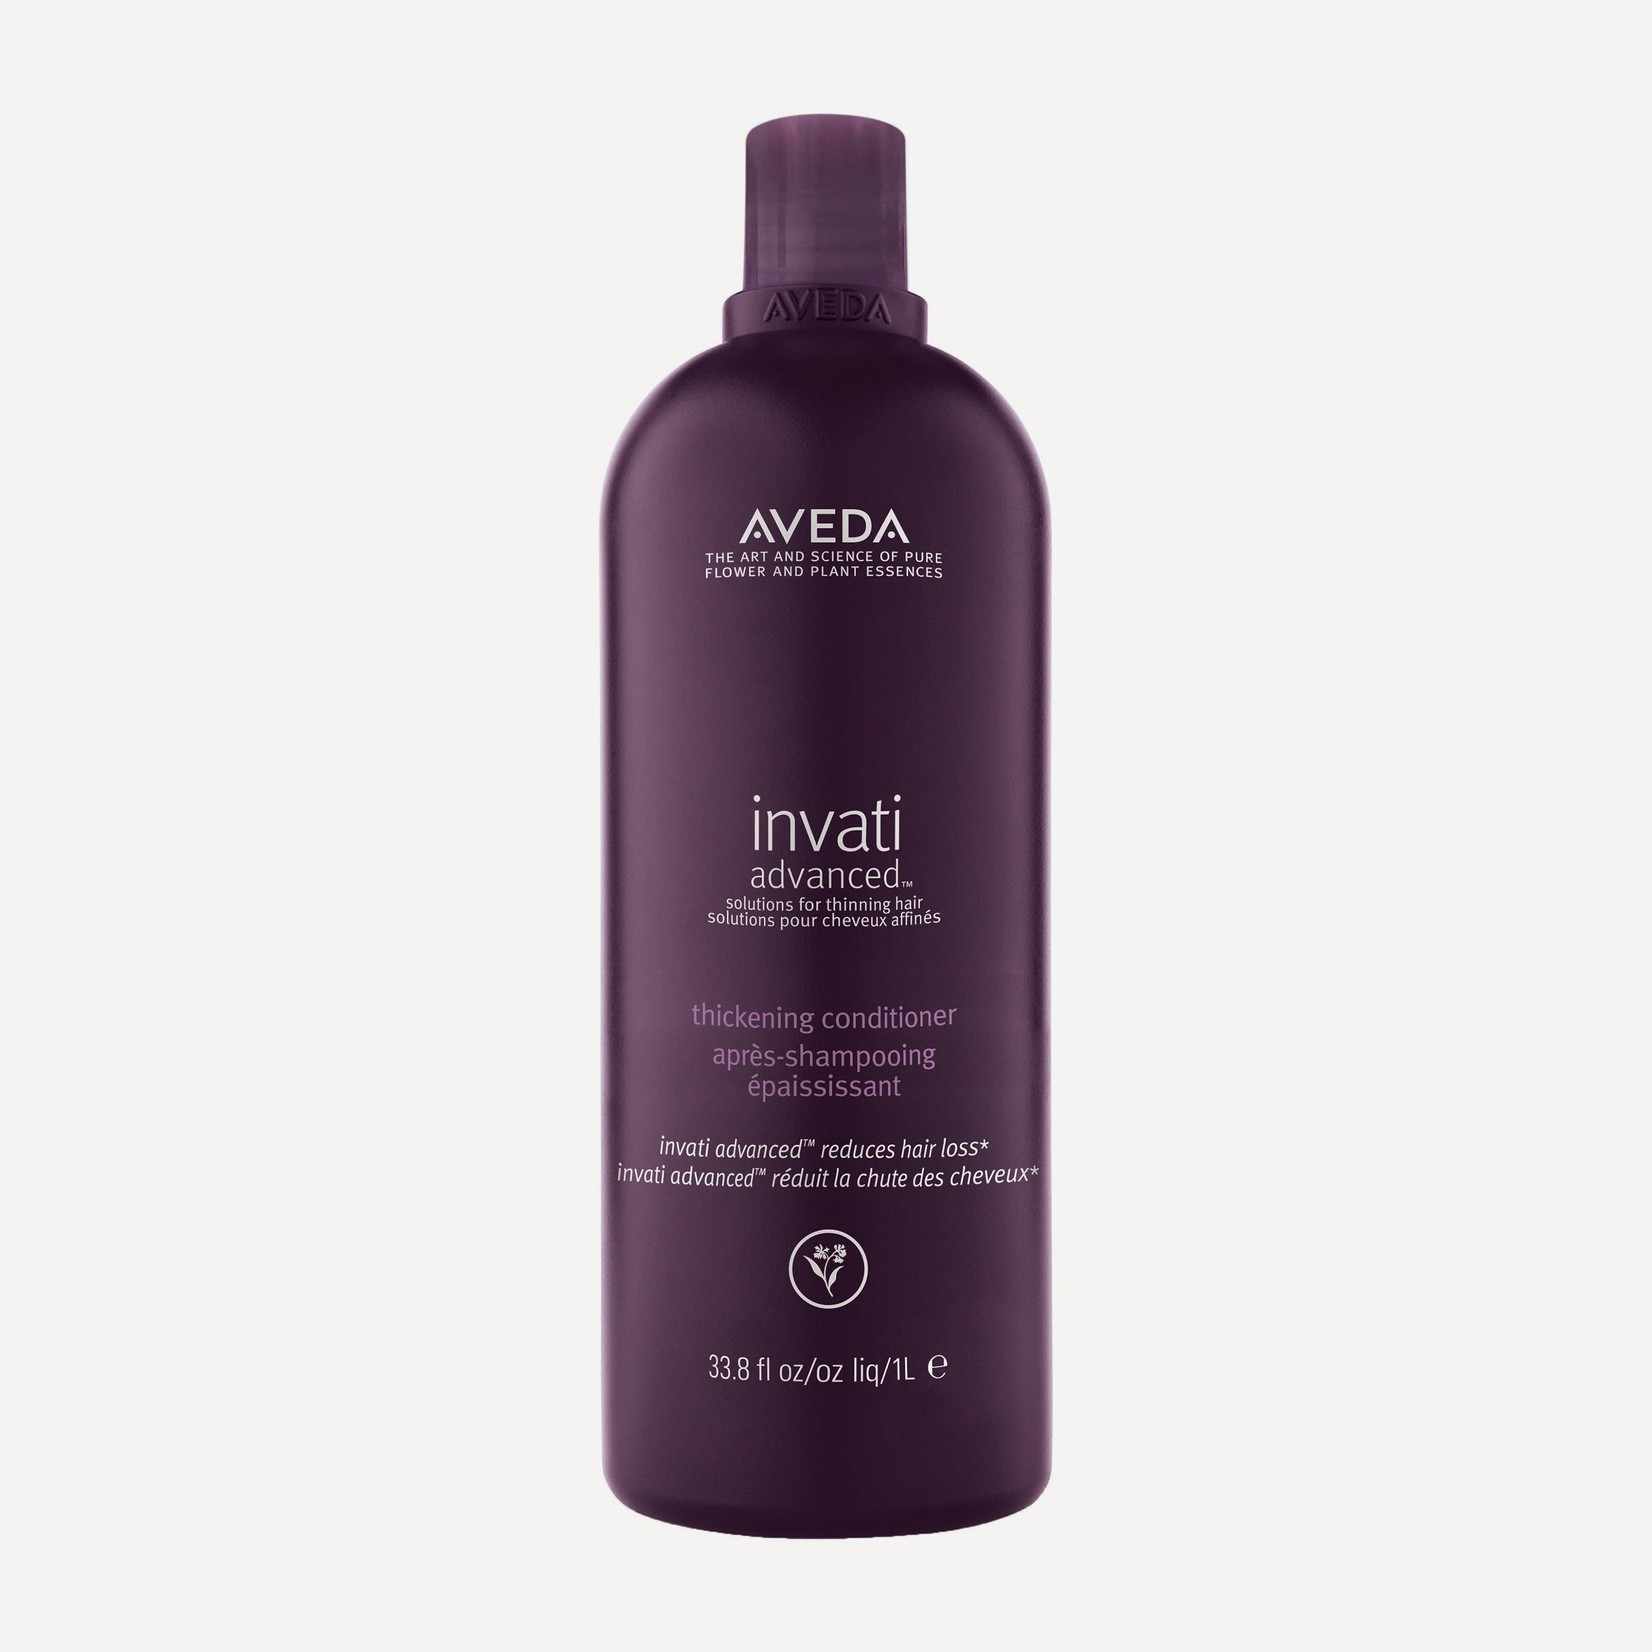 AVEDA Invati Advanced™ Thickening Conditioner